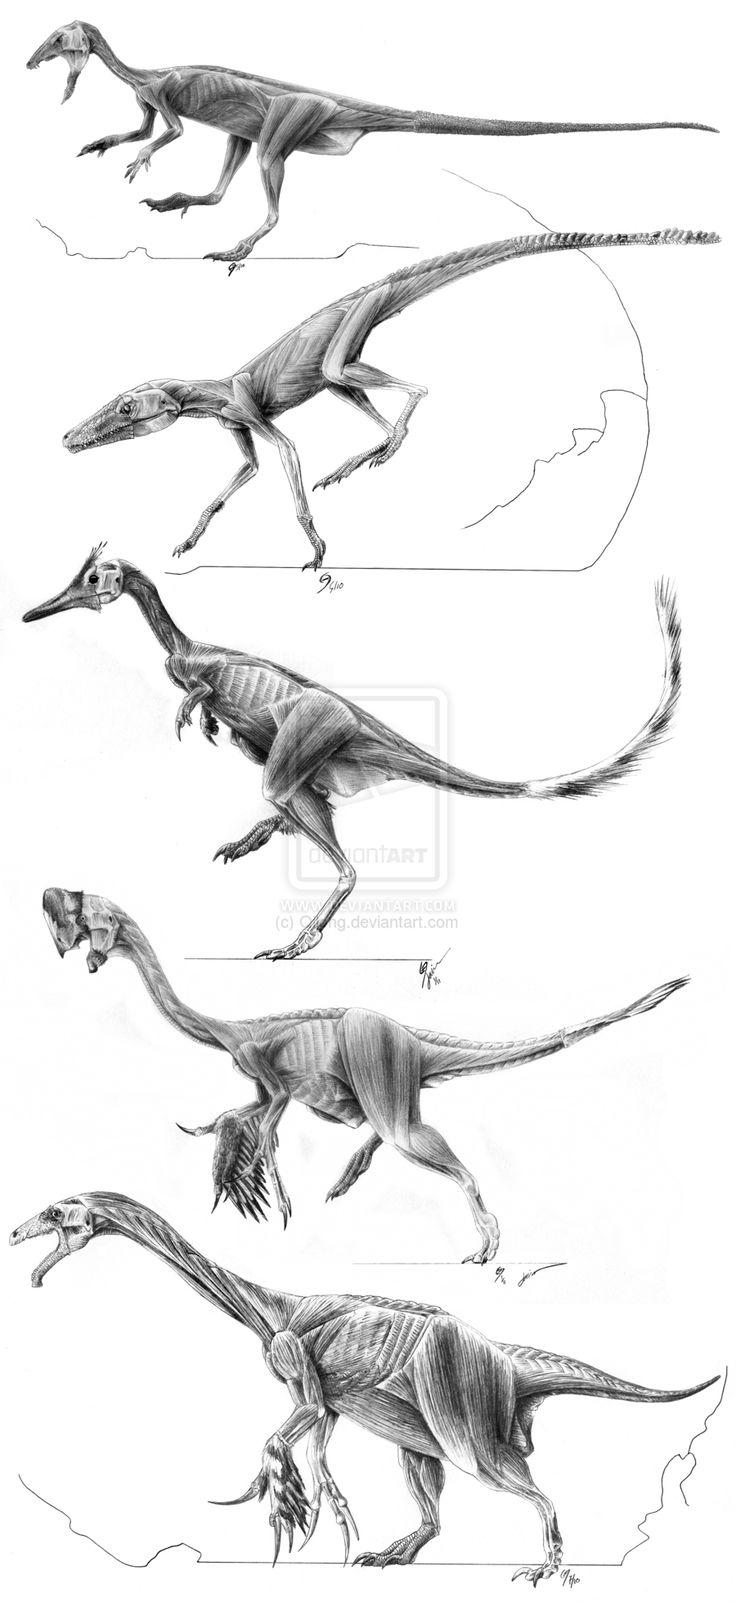 196 best Dinosaurs images on Pinterest   Dinosaurs, Prehistoric ...